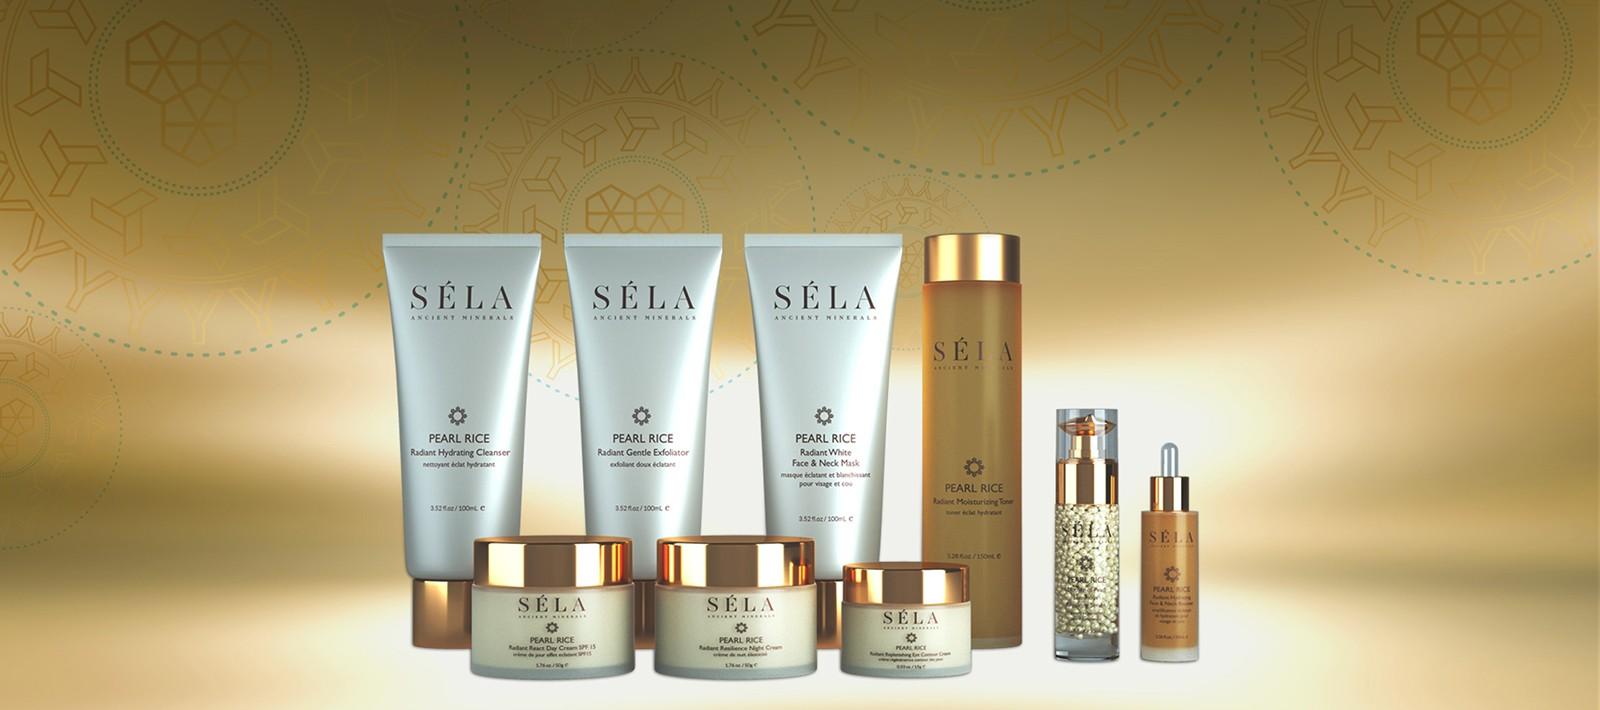 Sela-skincare-brand-creation-2